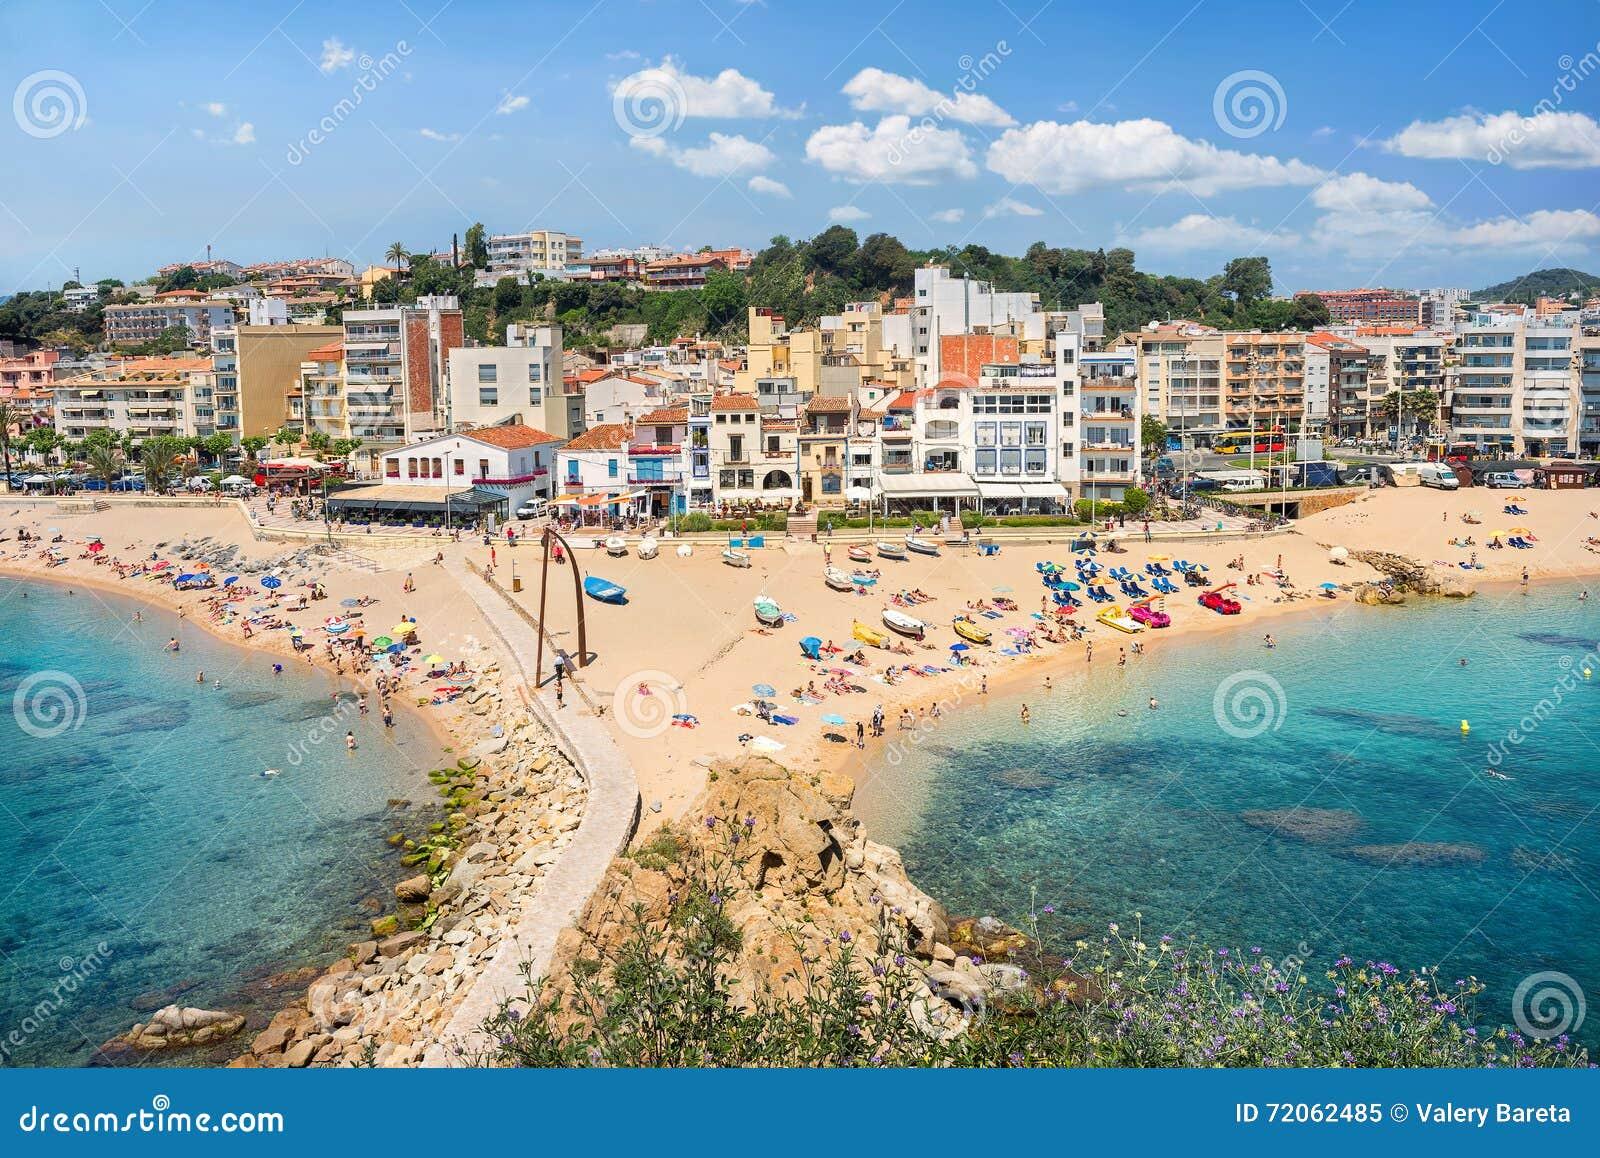 Blanes strand costa brava cataloni spanje stock for Oficina de treball blanes